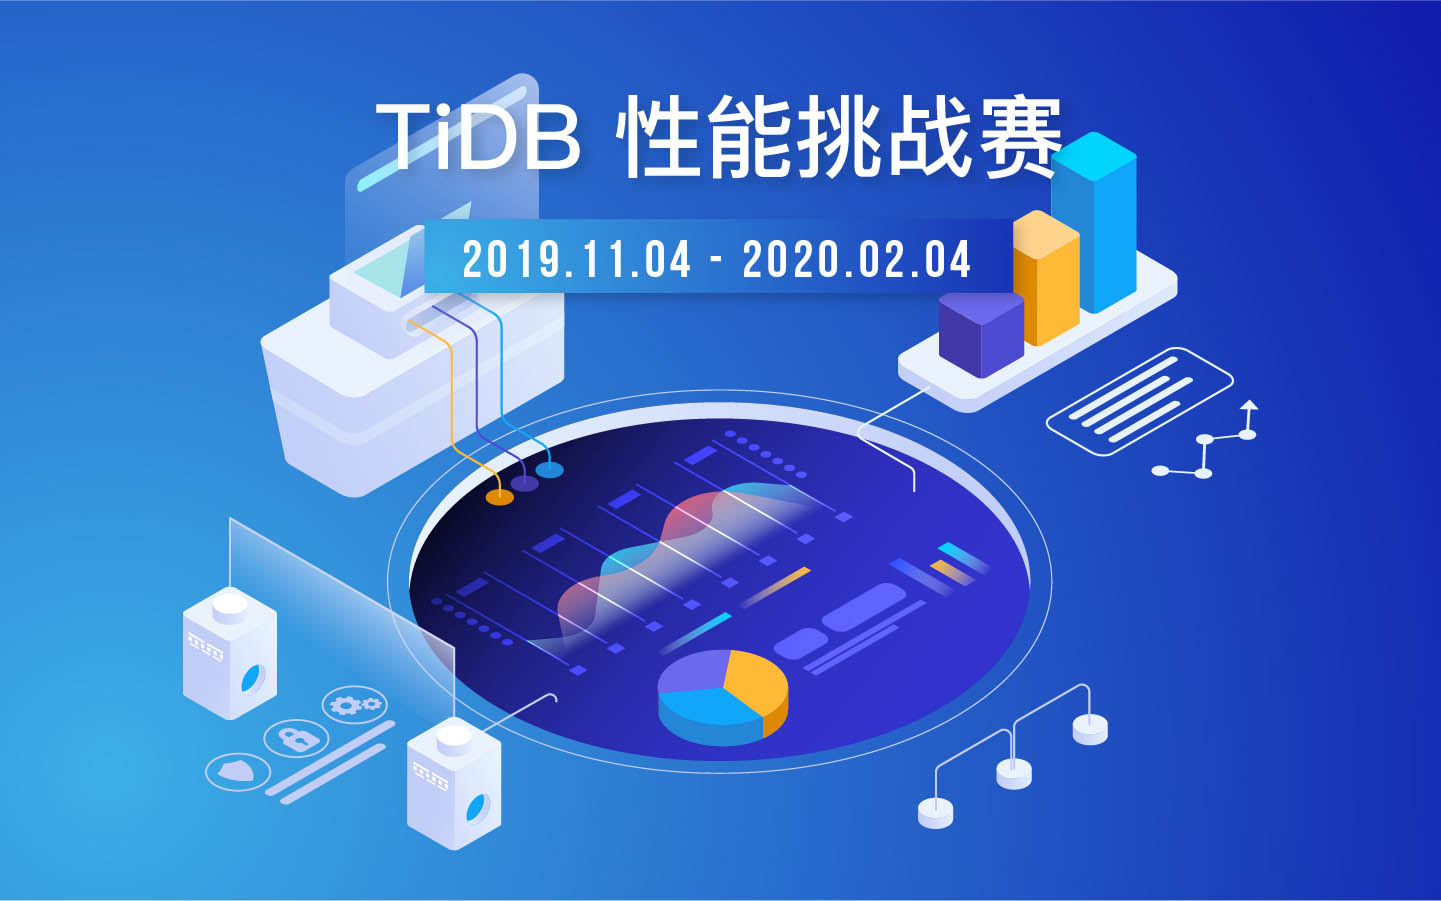 TiDB Performance Challenge banner